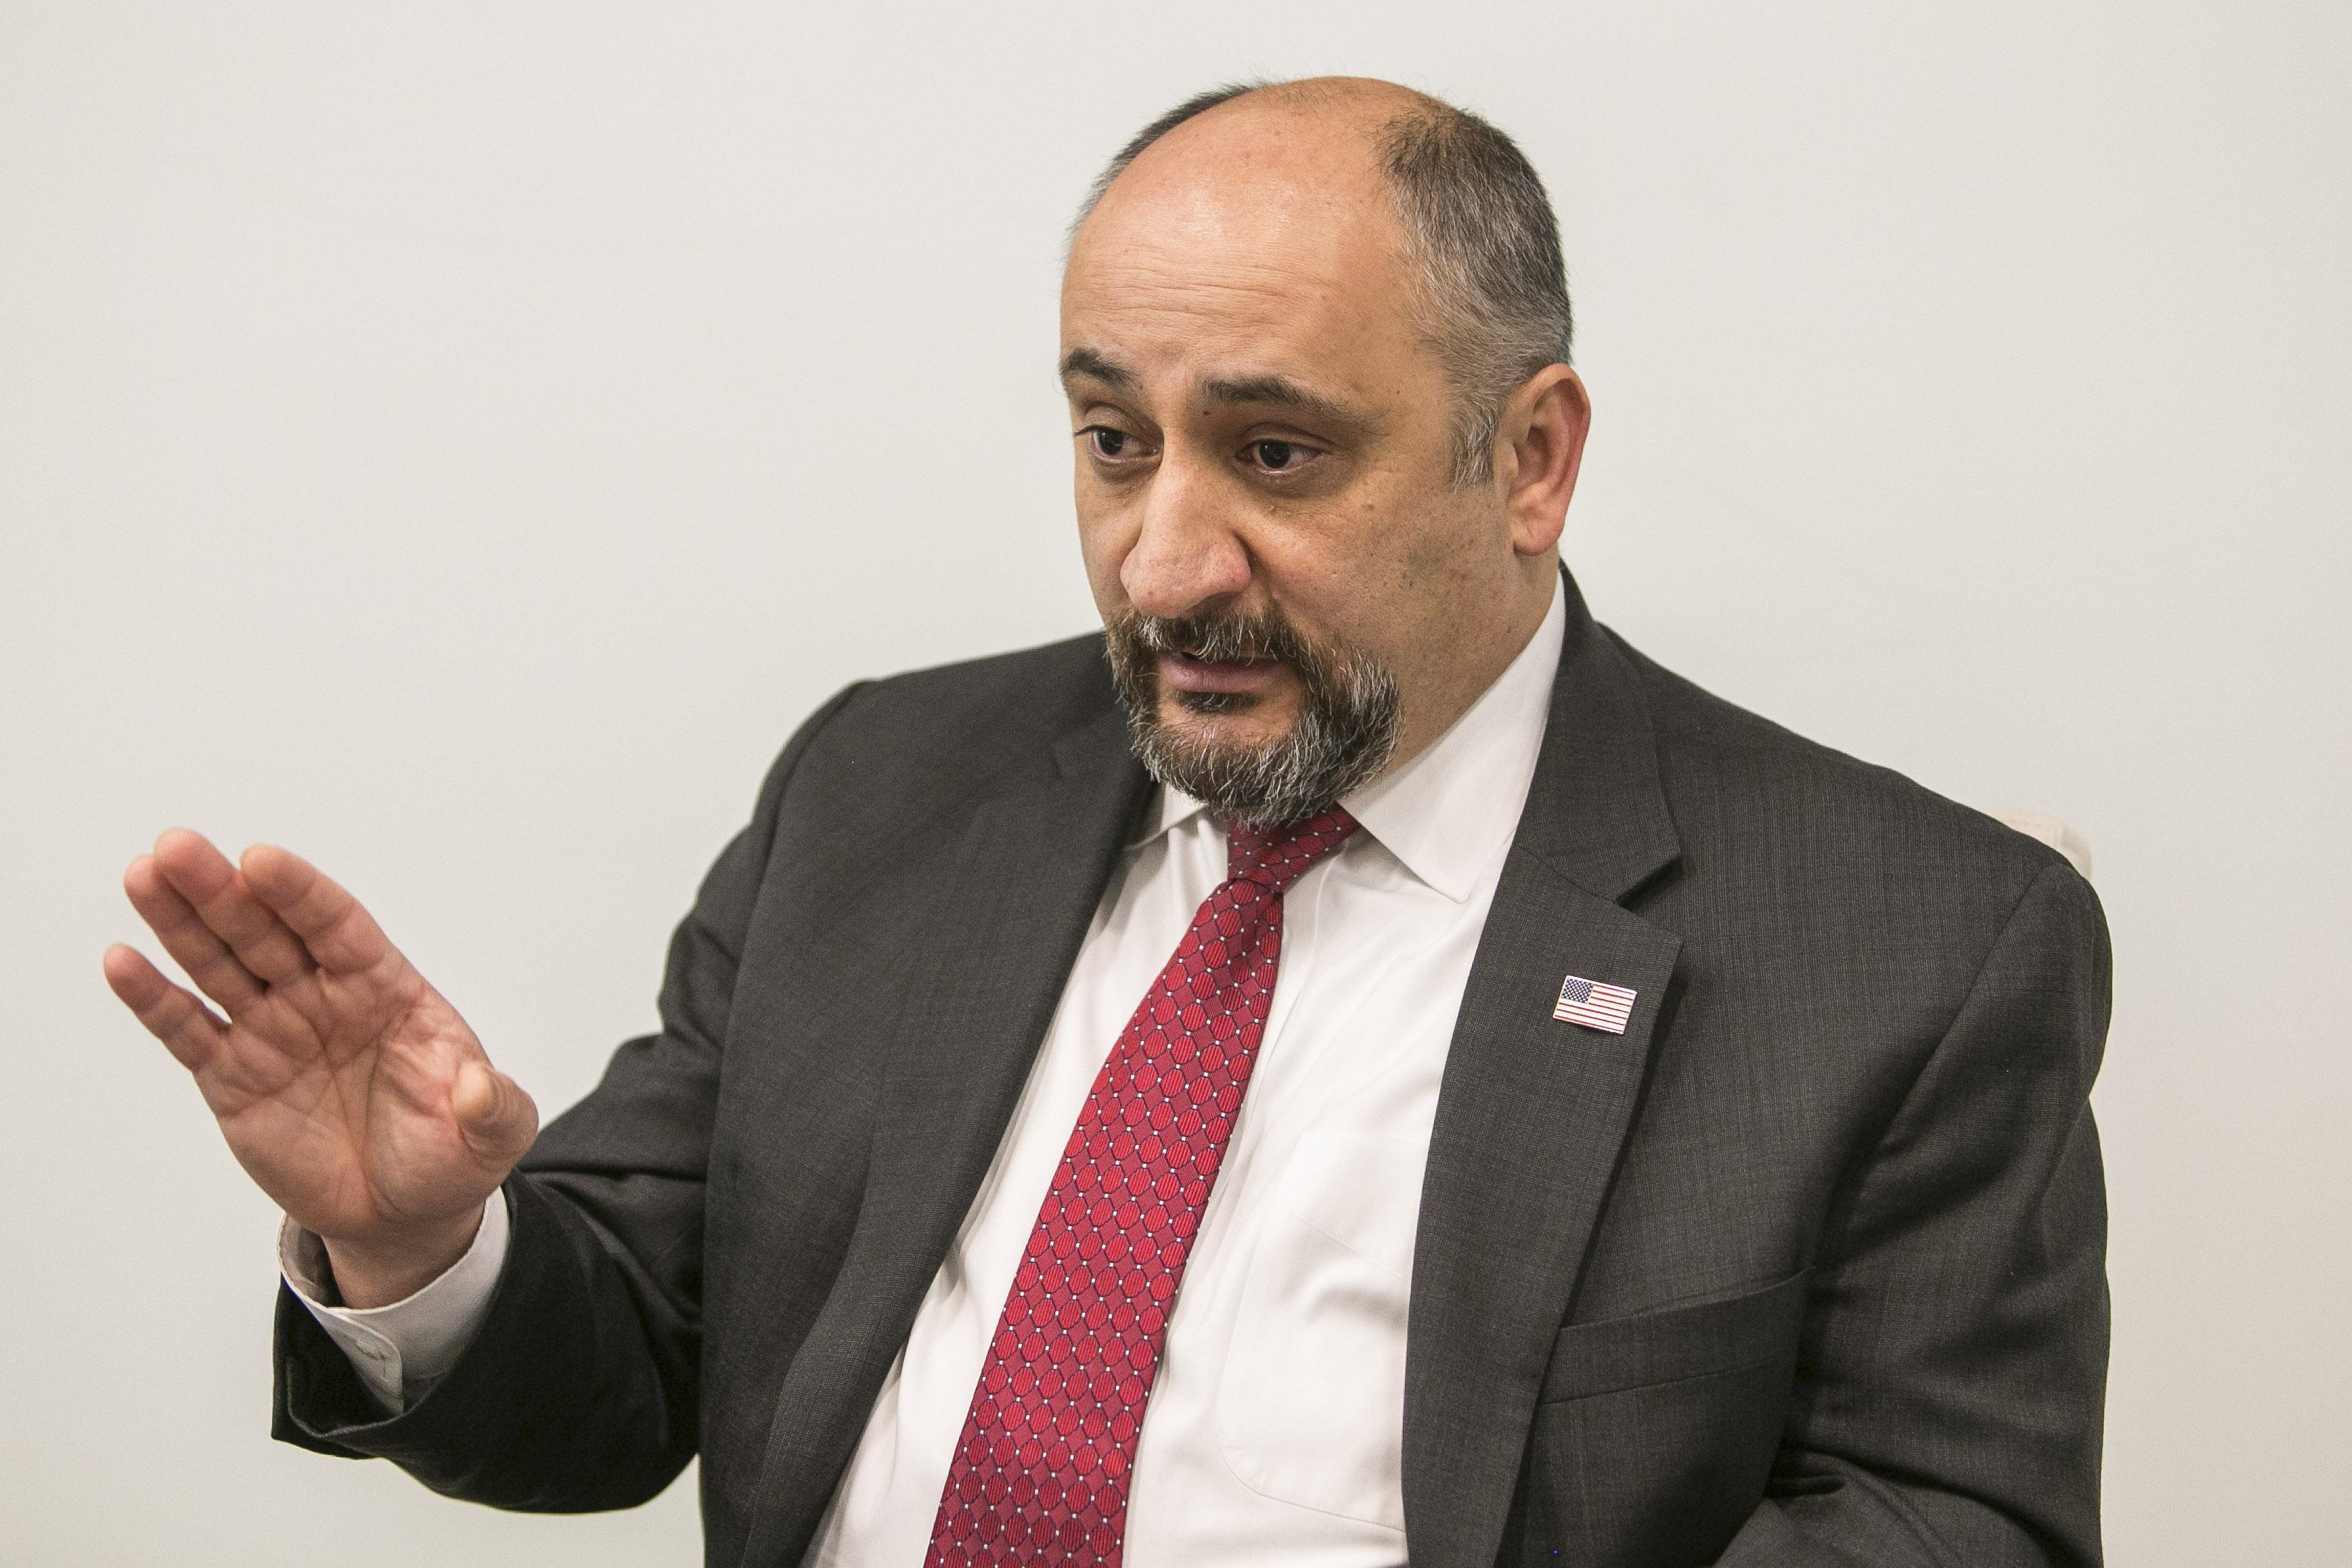 Sargis Sangari, 9th Congressional District Republican nominee, candidate questionnaire, 2020 election